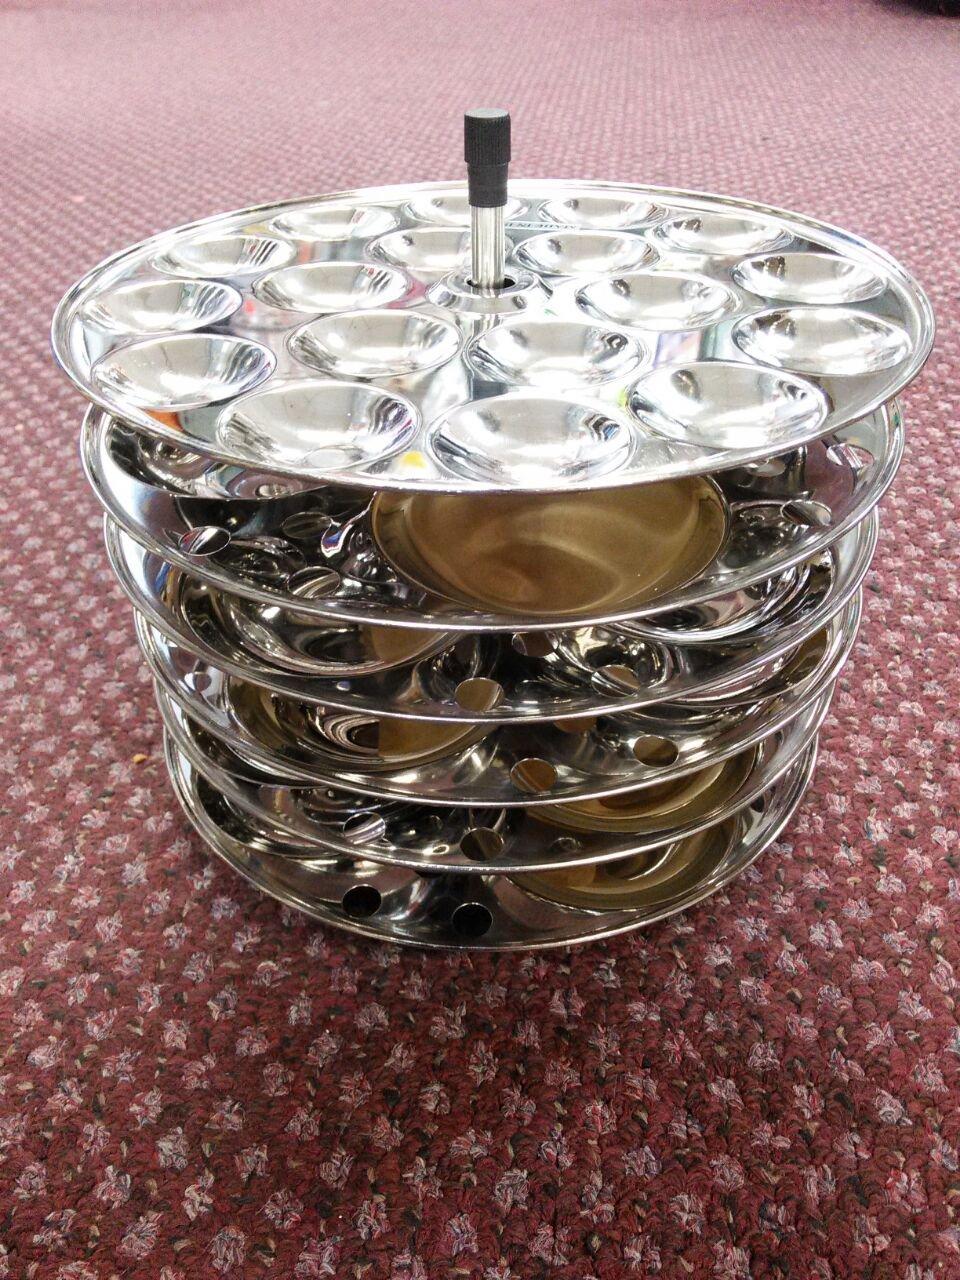 Butterfly 5 idli Plates+1Mini Idli Plates with Stand